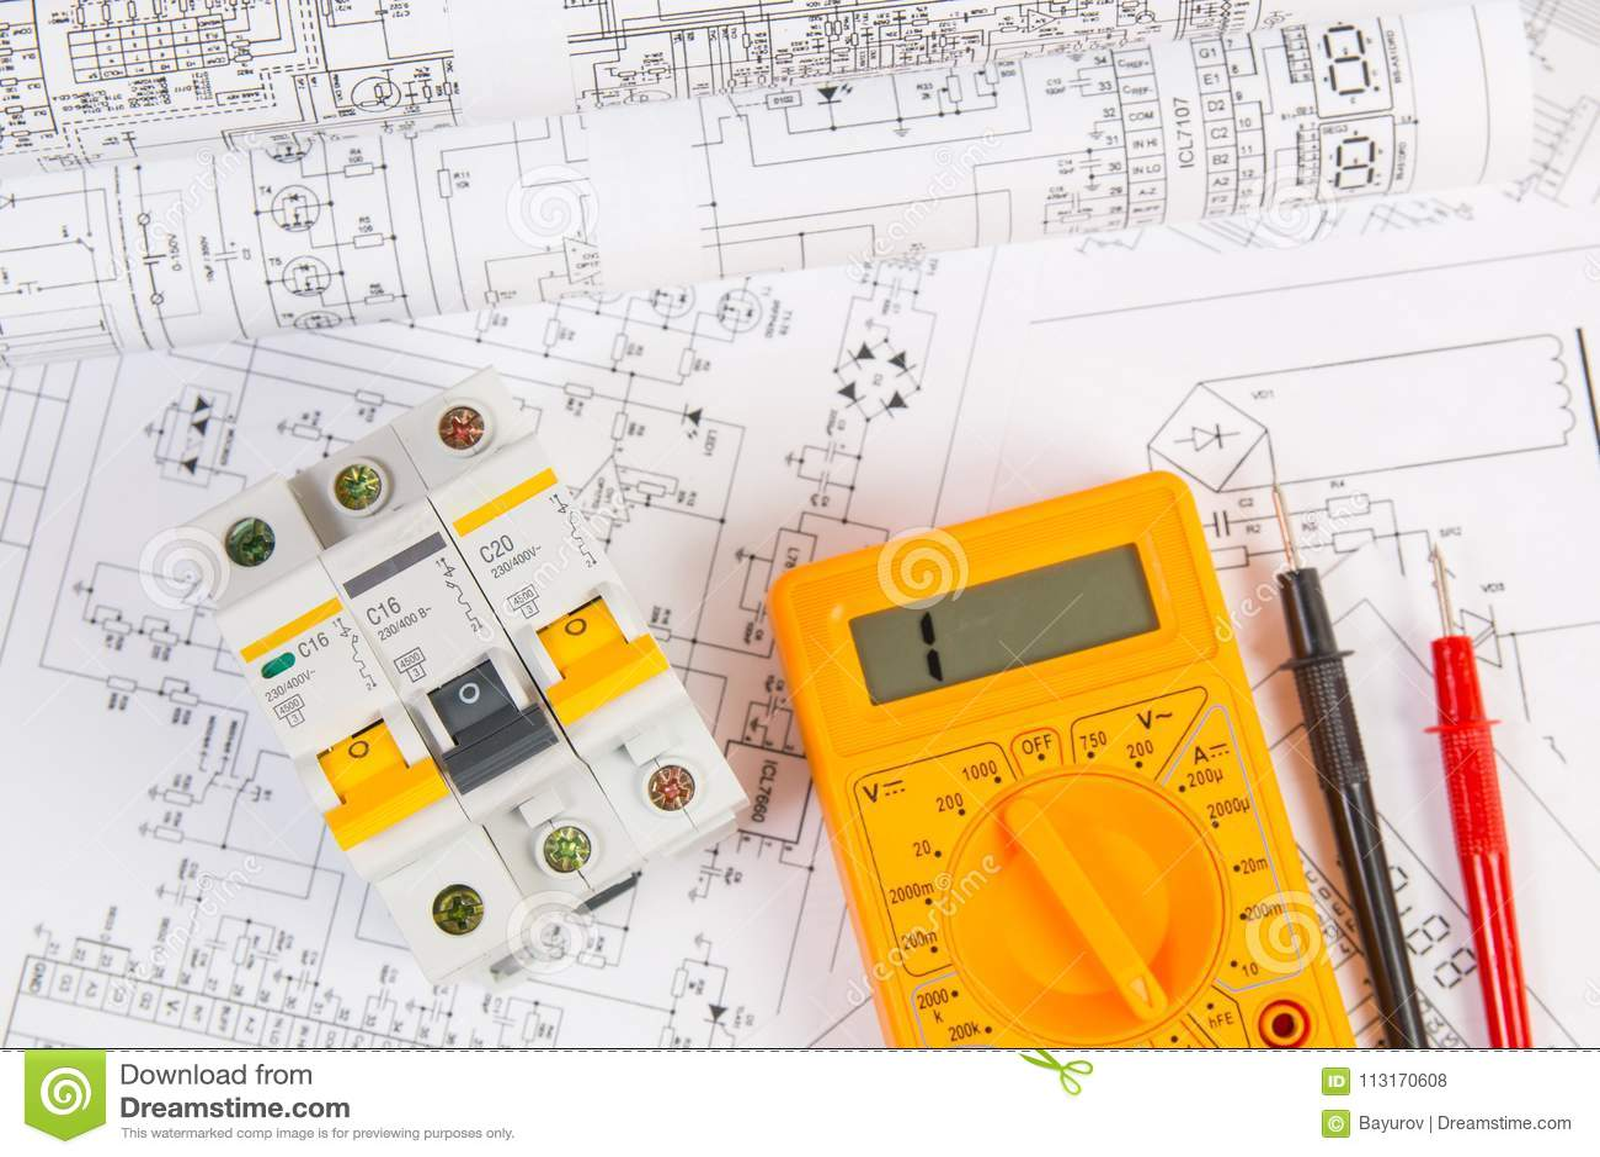 hight resolution of electrical engineering drawings modular circuit breaker and digital multimeter